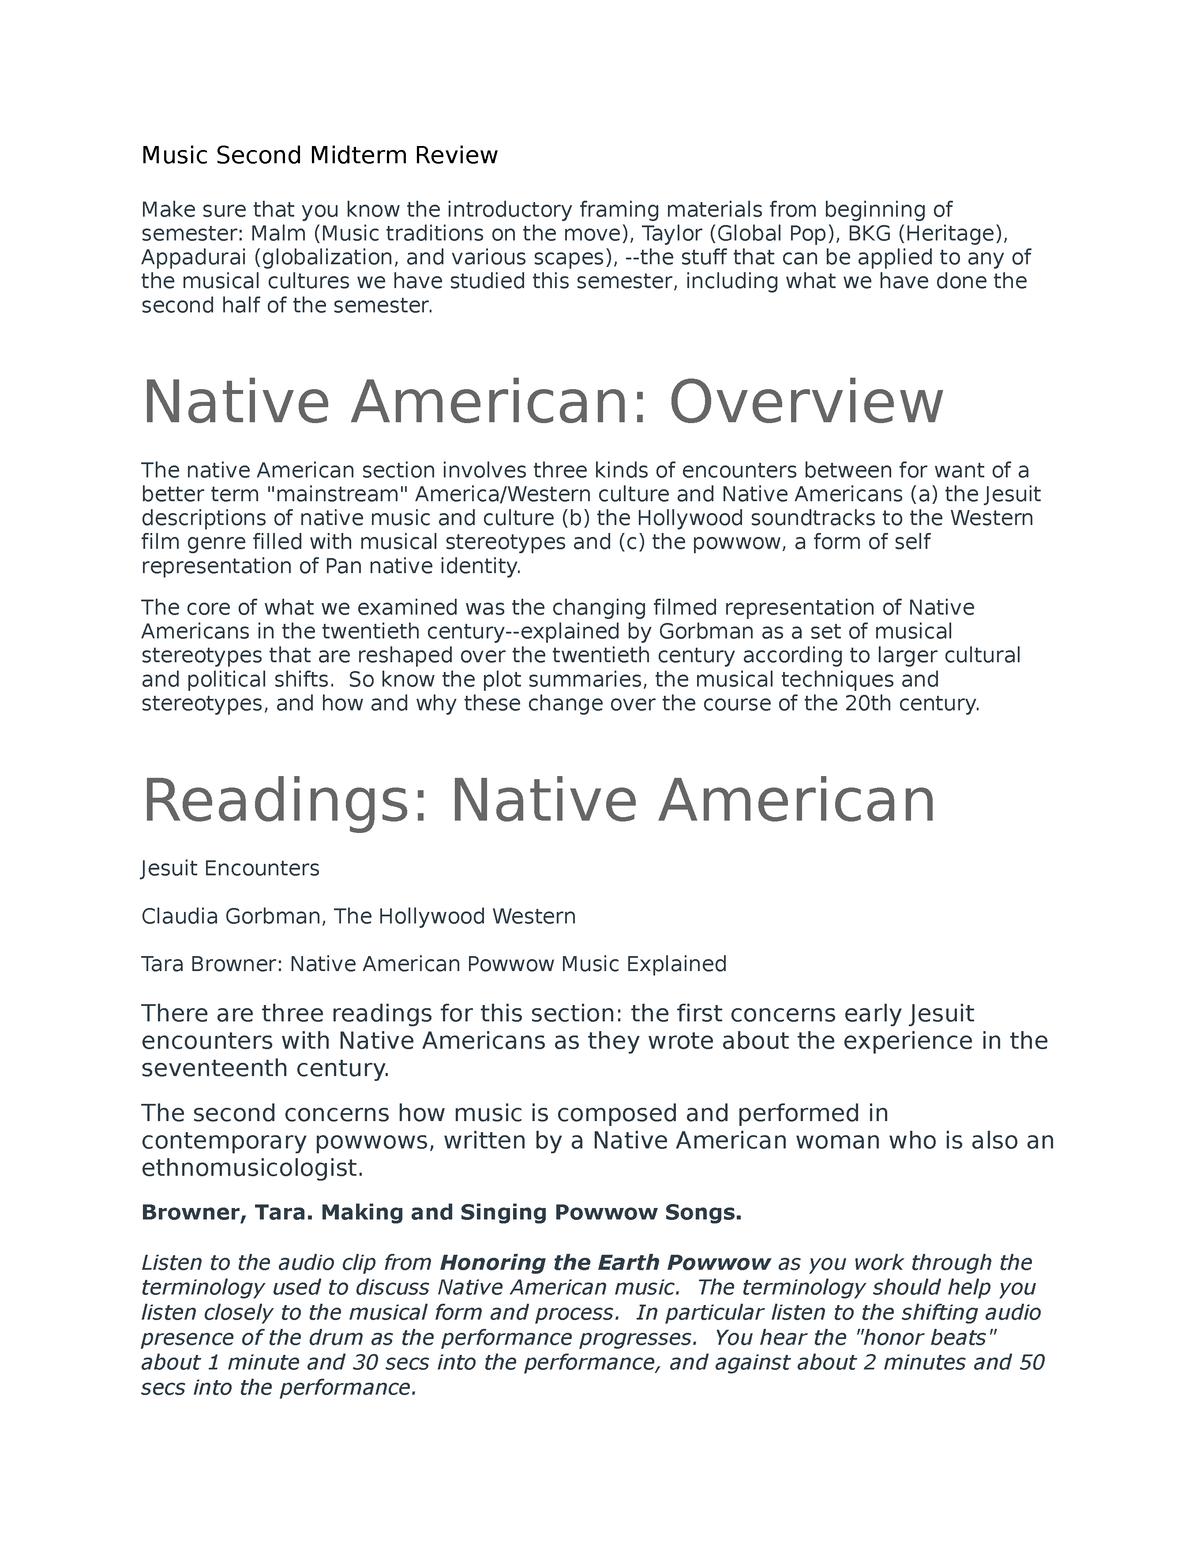 Midterm 2 Review & Lecture Notes - AFRC 050 - UPENN - StuDocu